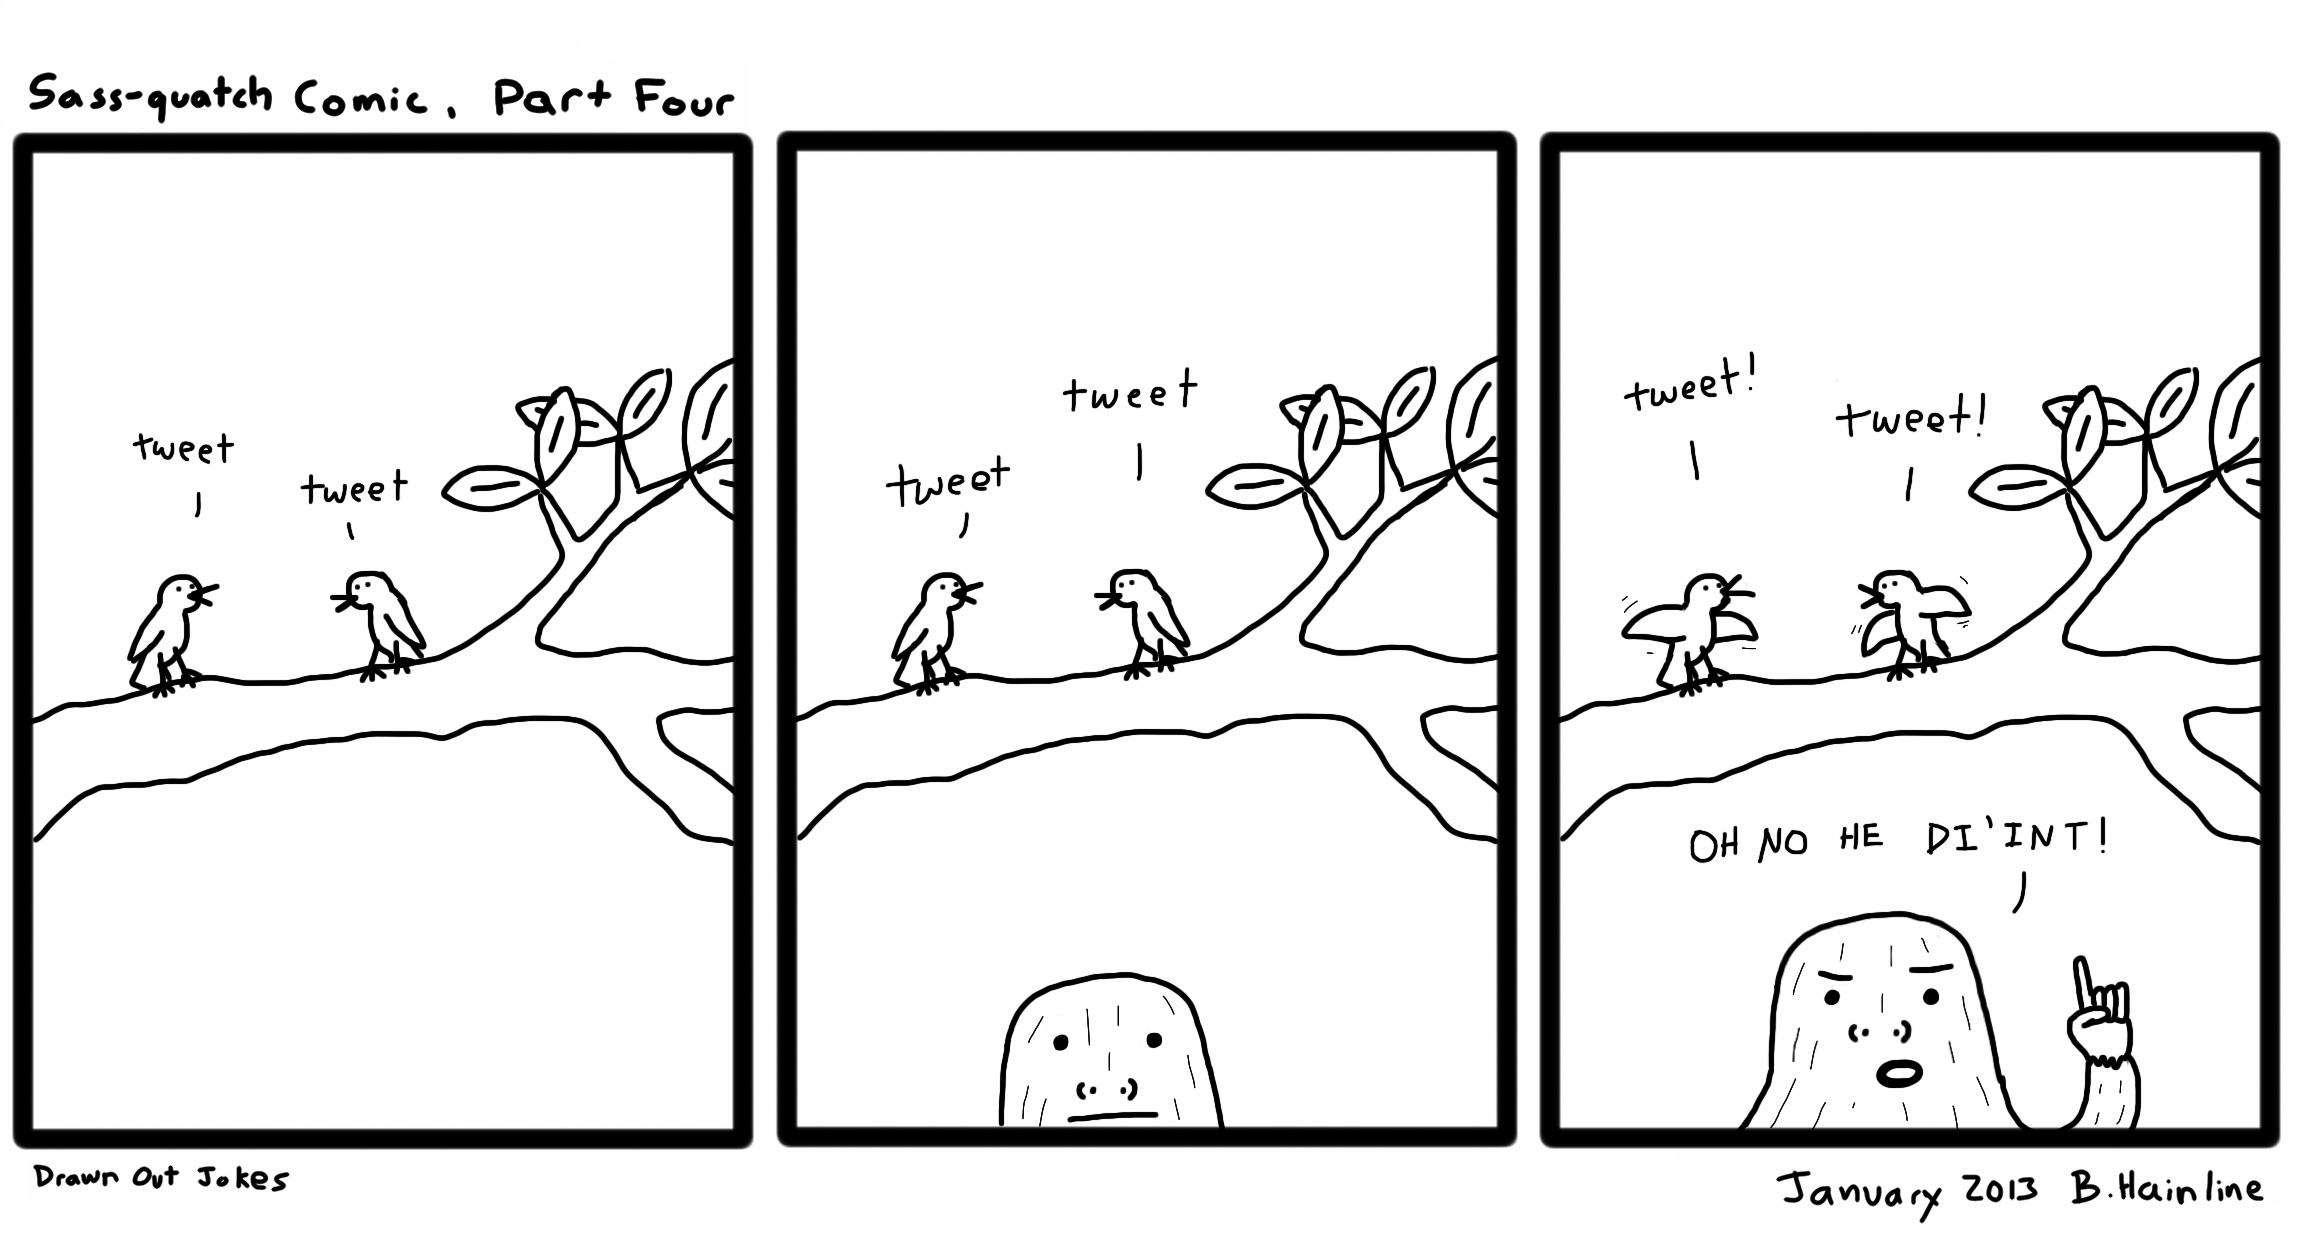 Sass-quatch Comic, Part Four